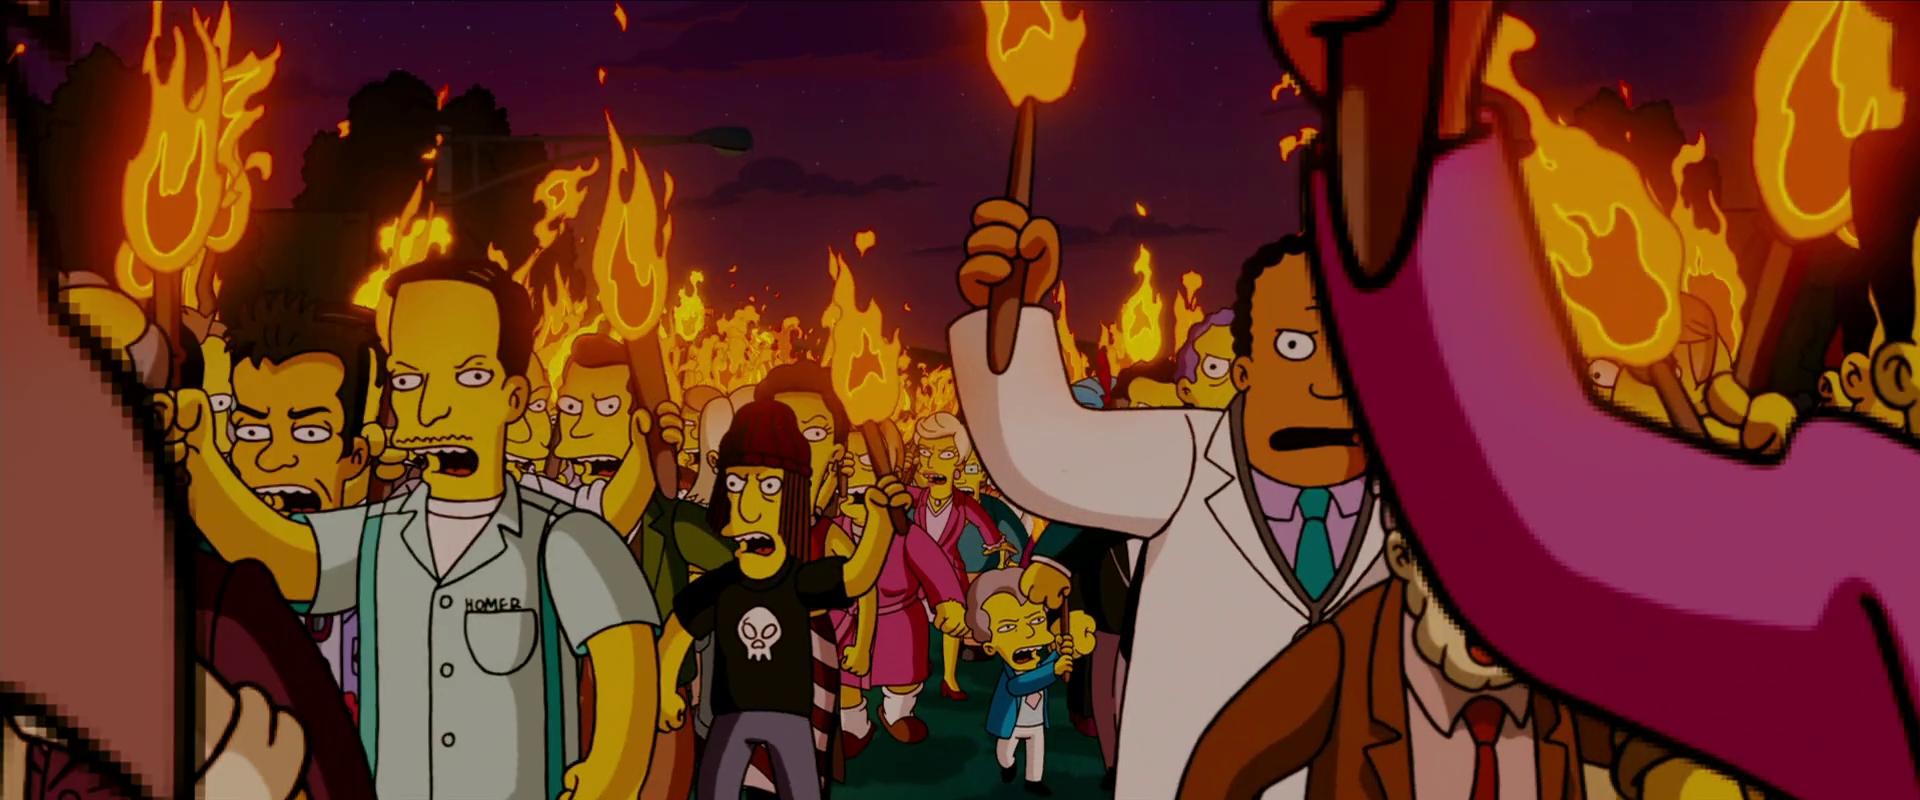 Un Ojo The Simpson Movie 2007